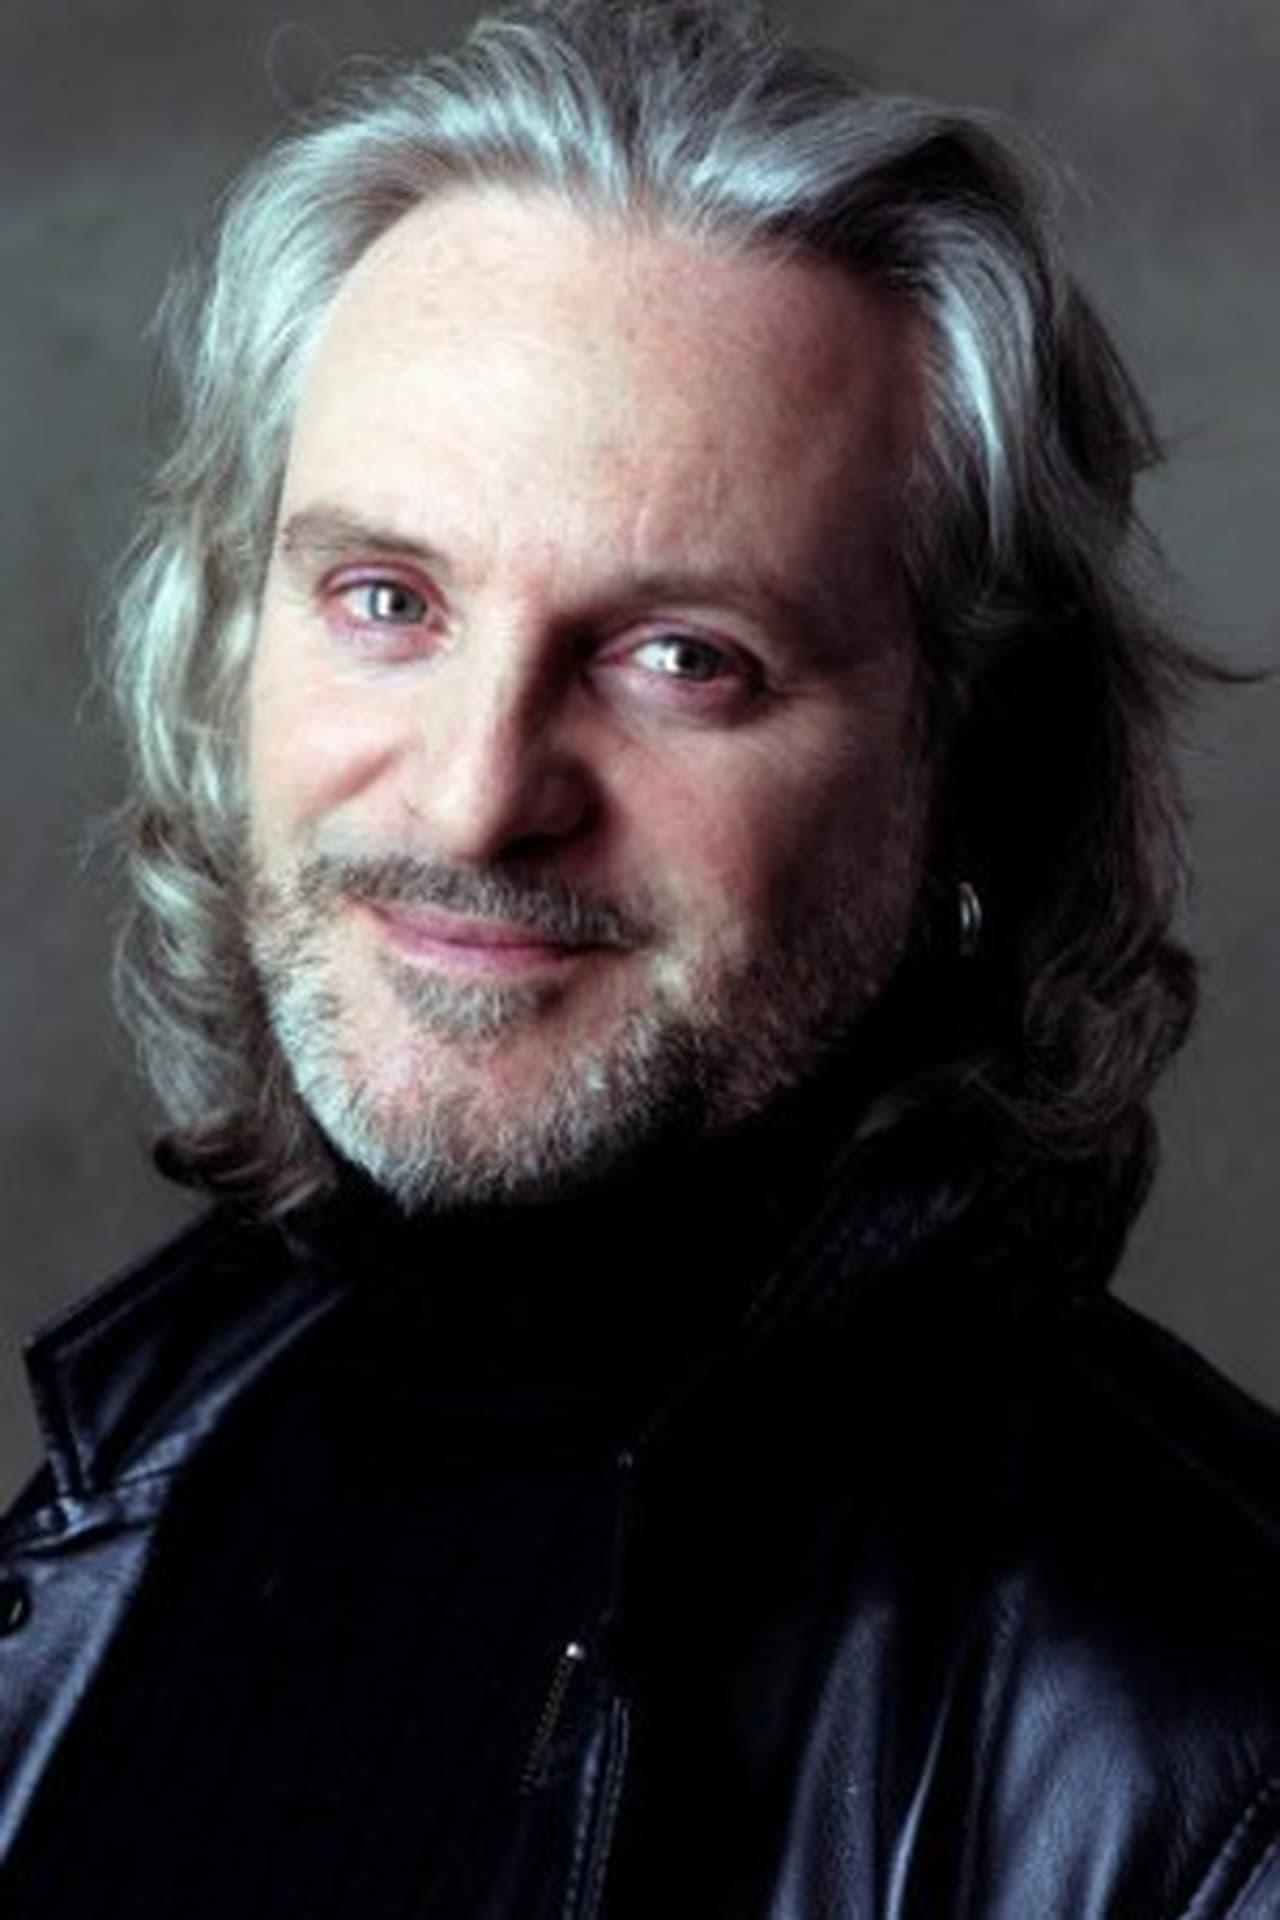 Pierre-Alain de Garrigues